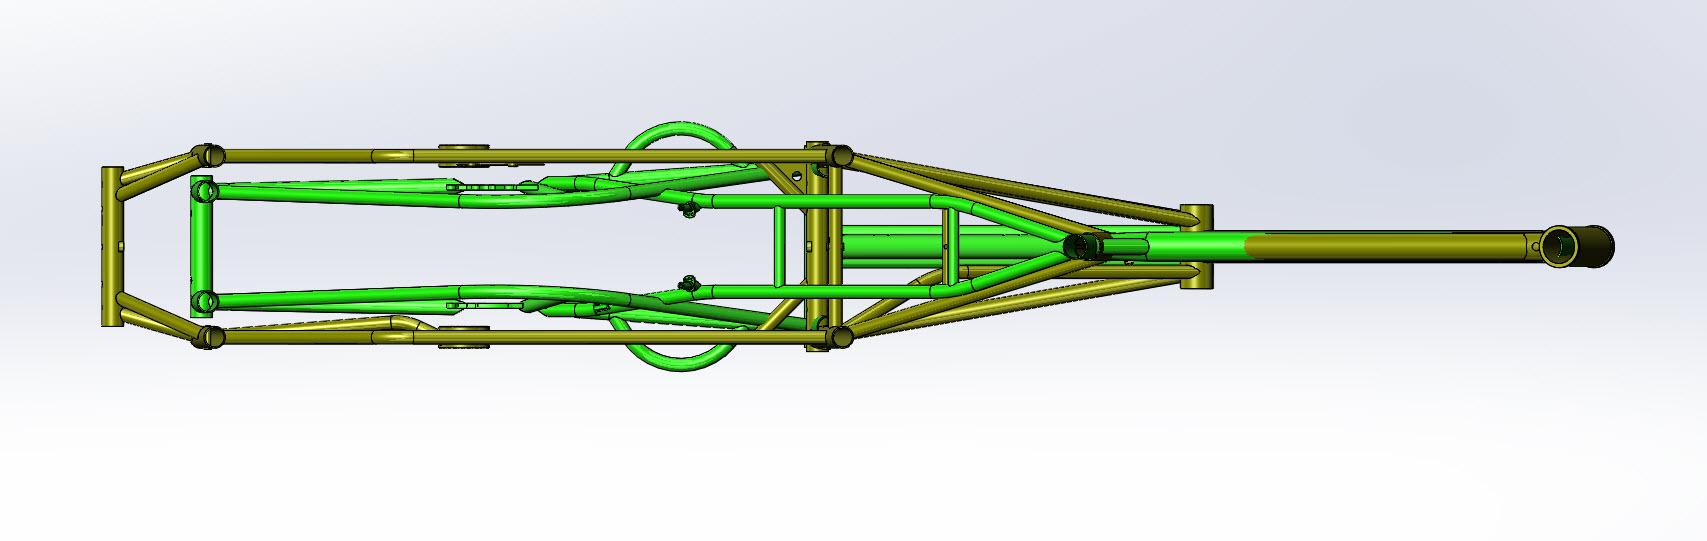 CAD illustration of a Surly Bike Fat Dummy bike frame and Kawi bike frame - overlays - overhead view